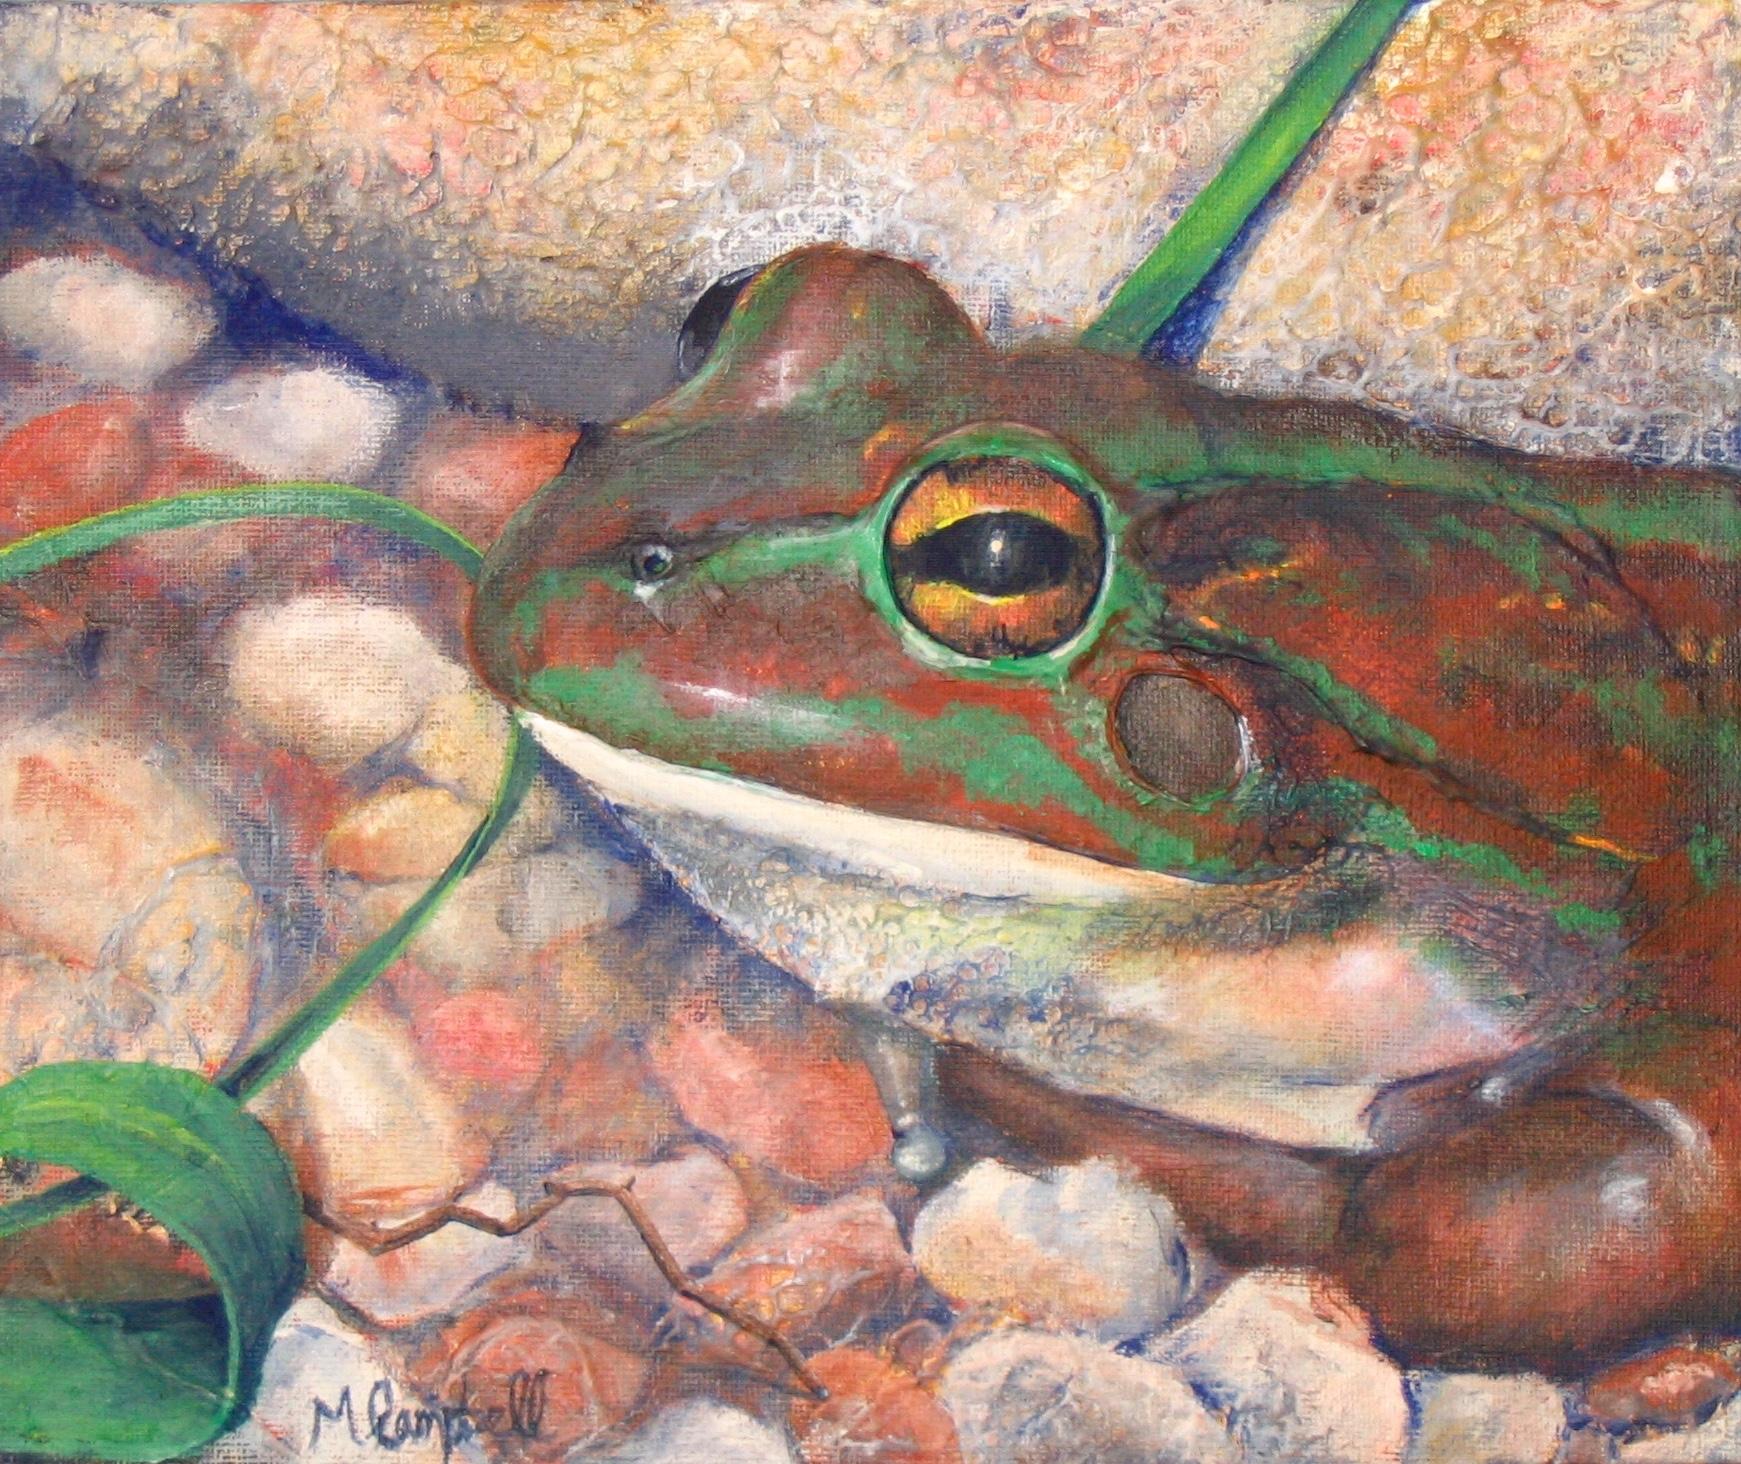 Frog, Healesville Sanctuary